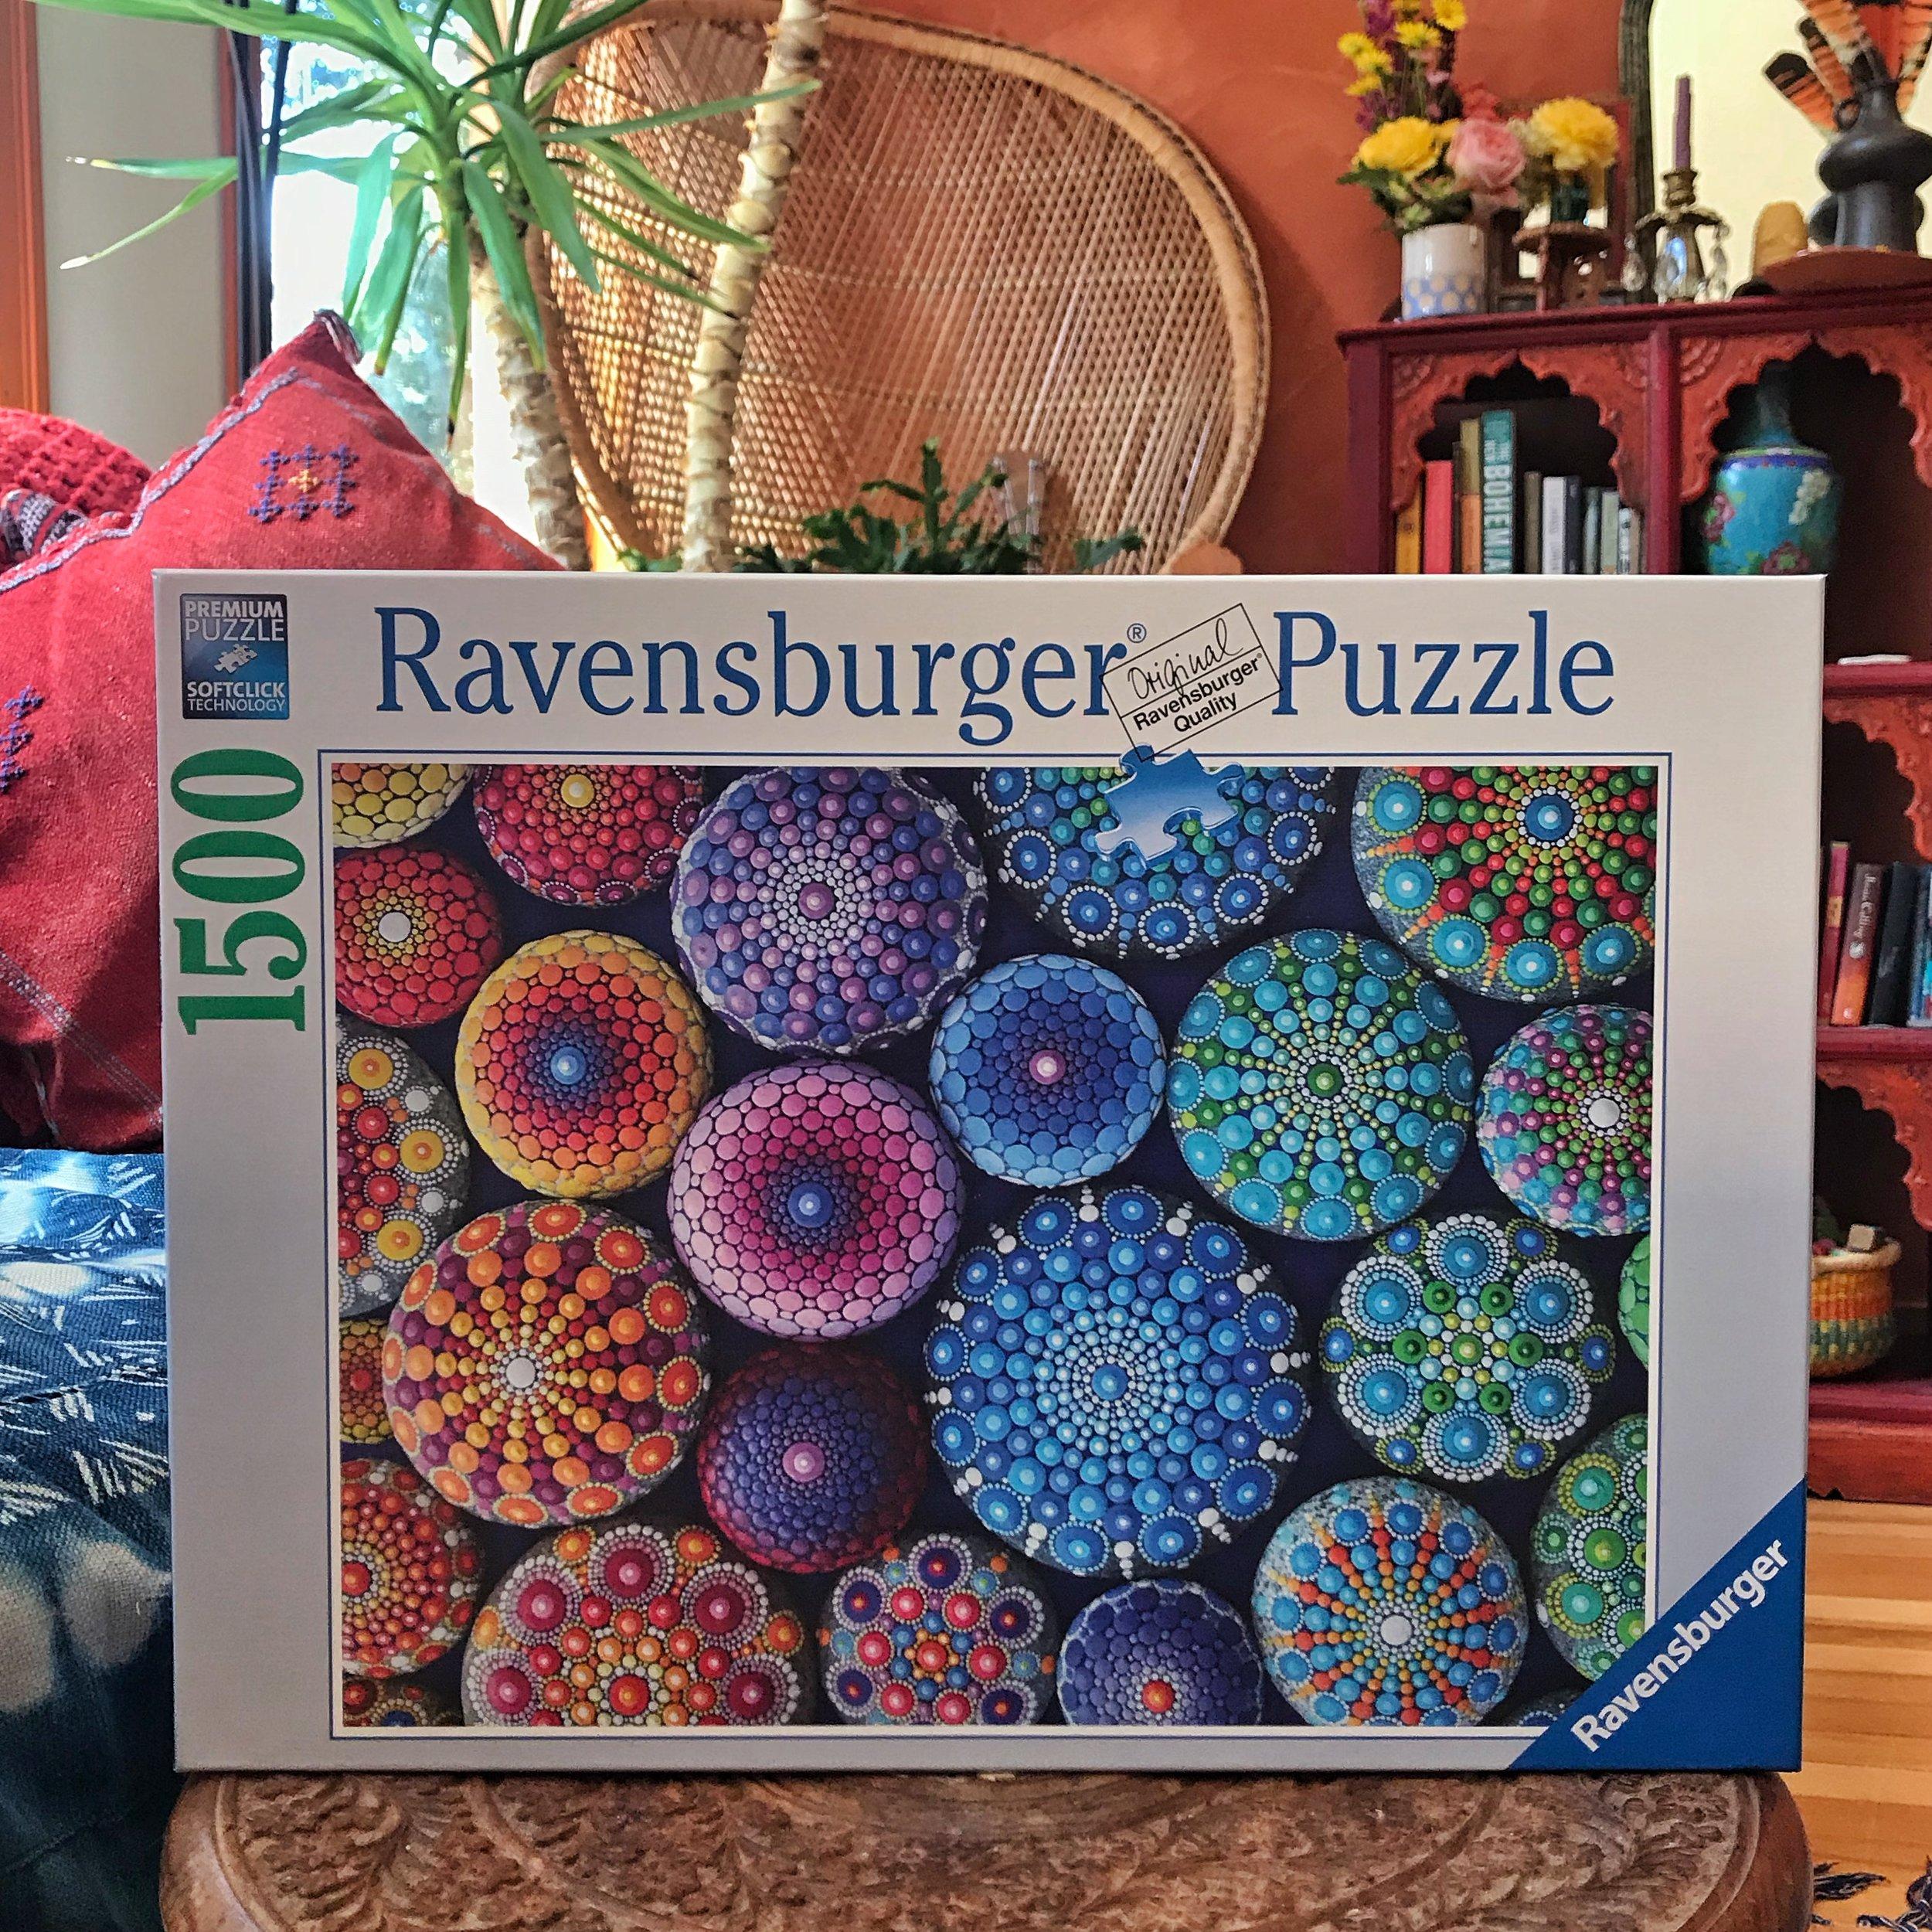 My Ravensburger Puzzle Colourful Artistry Mandala Stones Elspeth Mclean